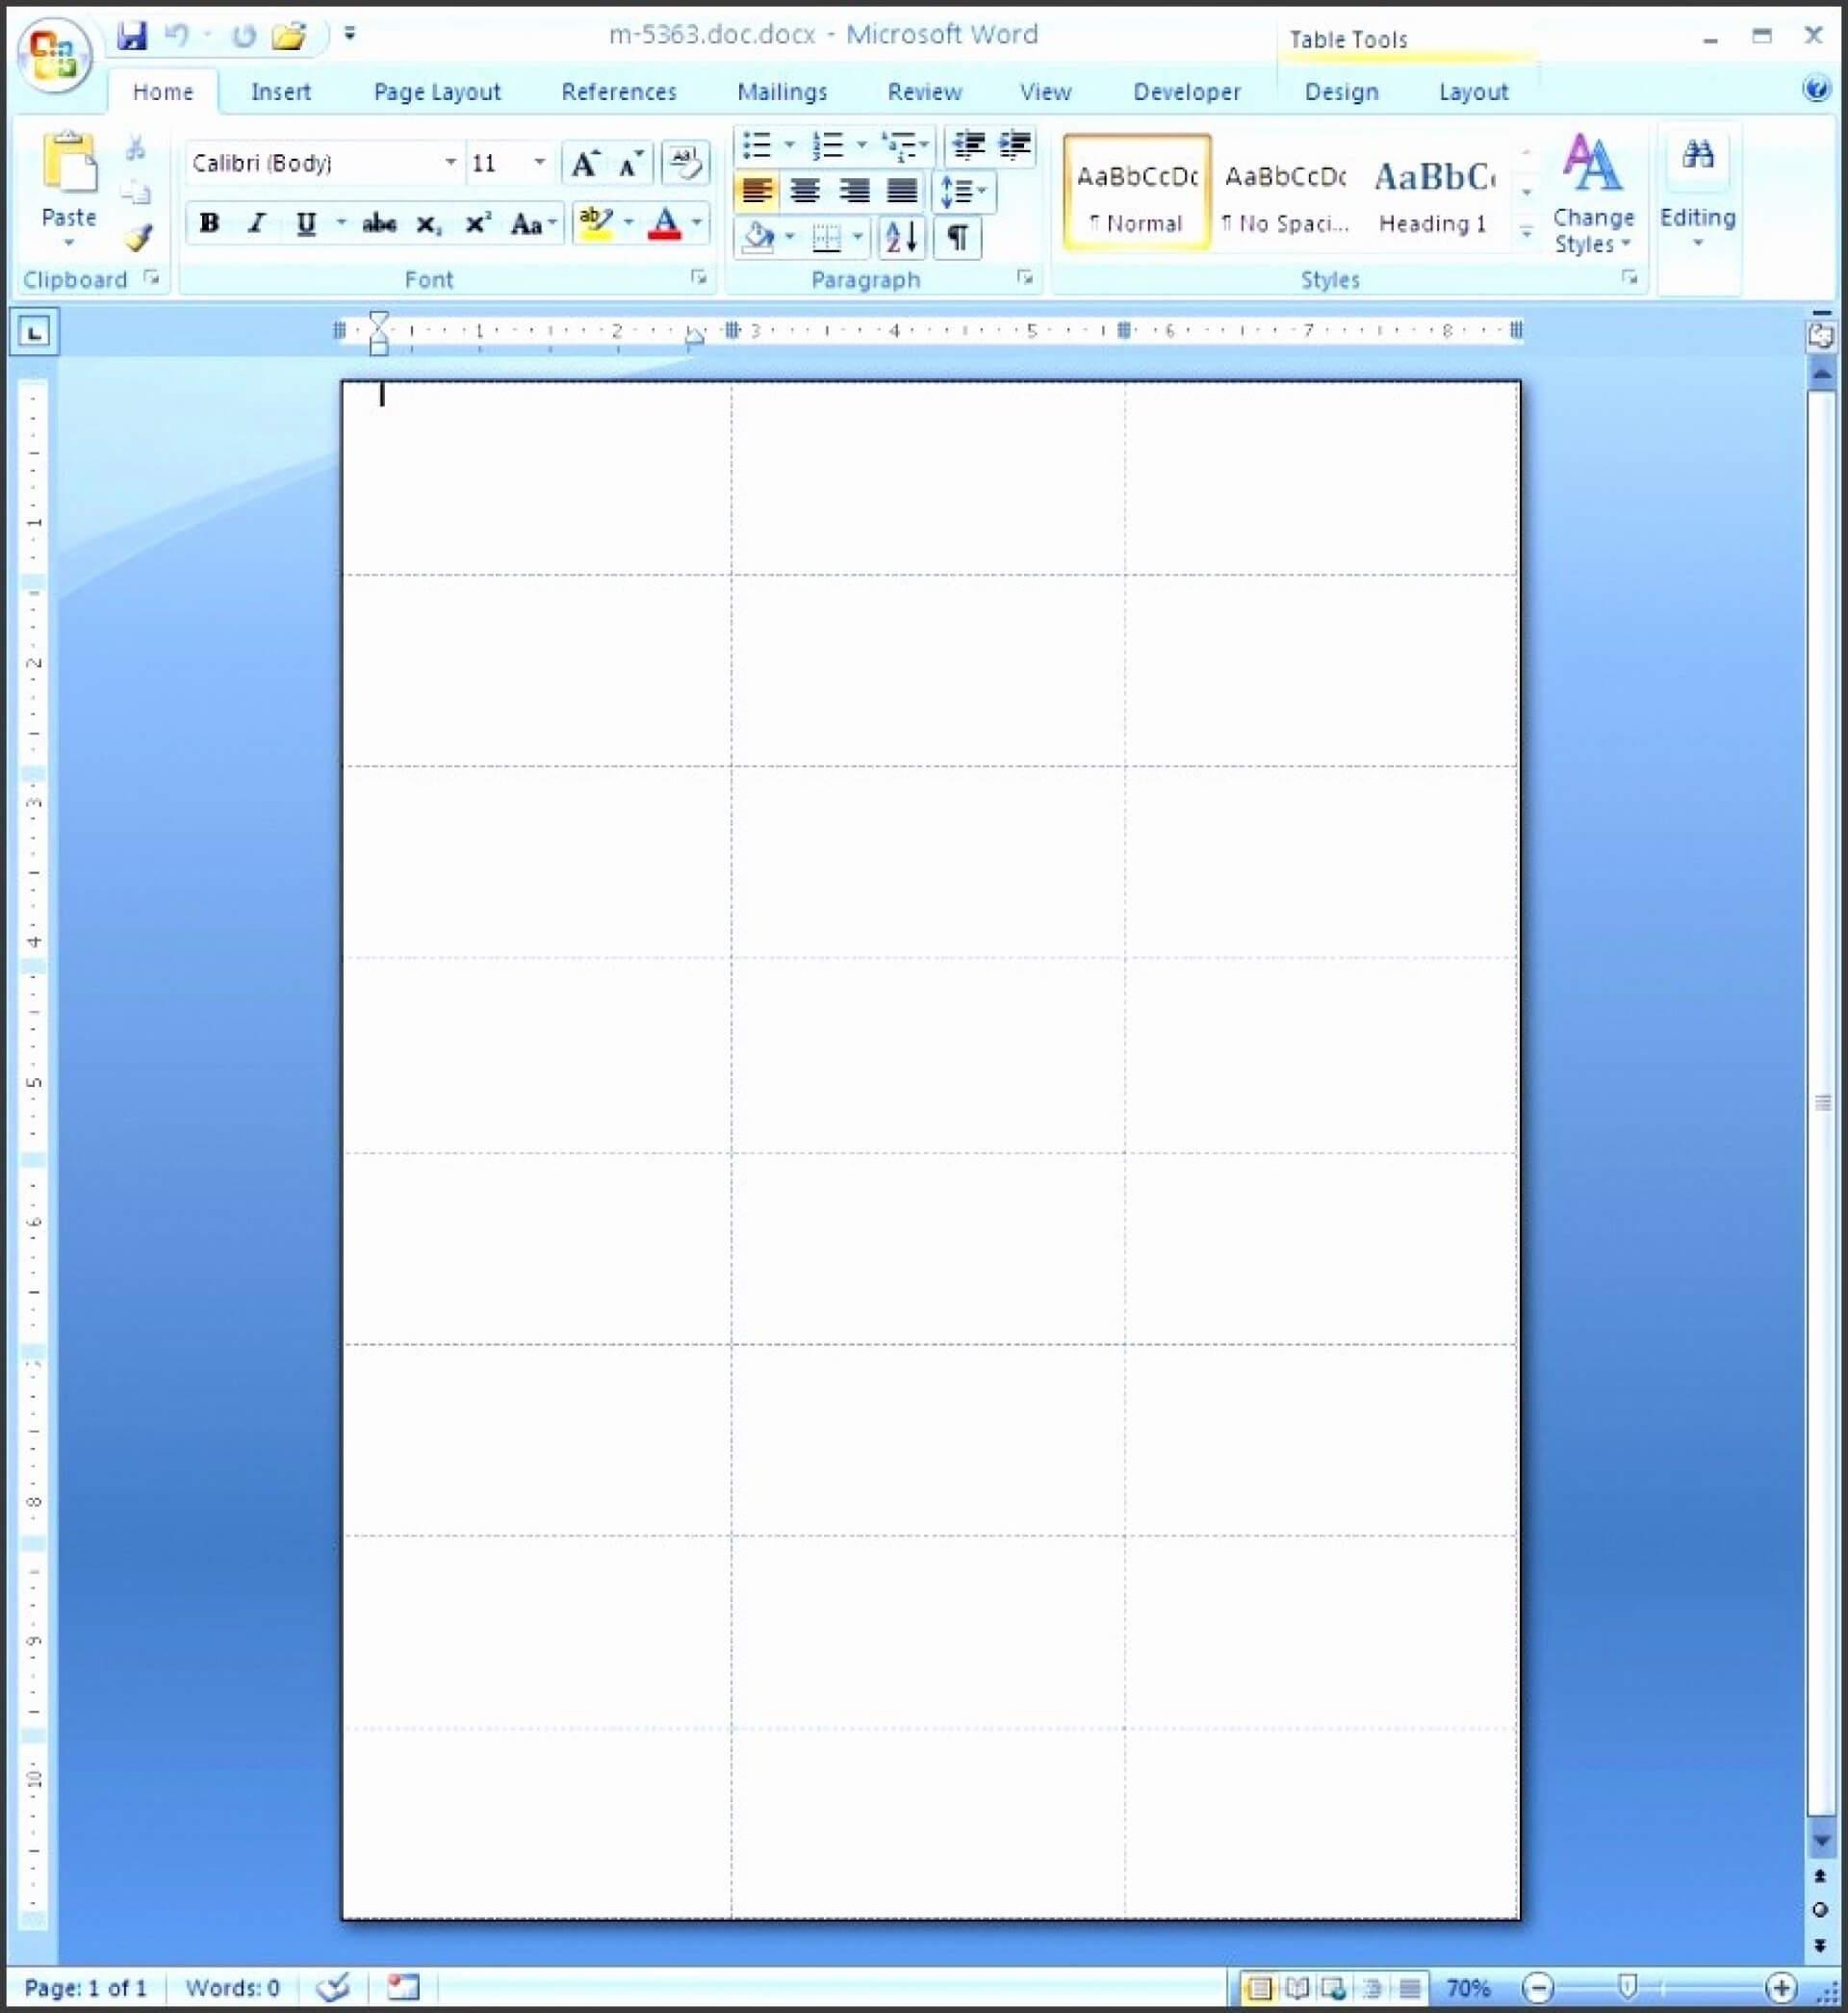 001 Microsoft Word Address Label Template Per Sheet Inside Address Label Template 16 Per Sheet